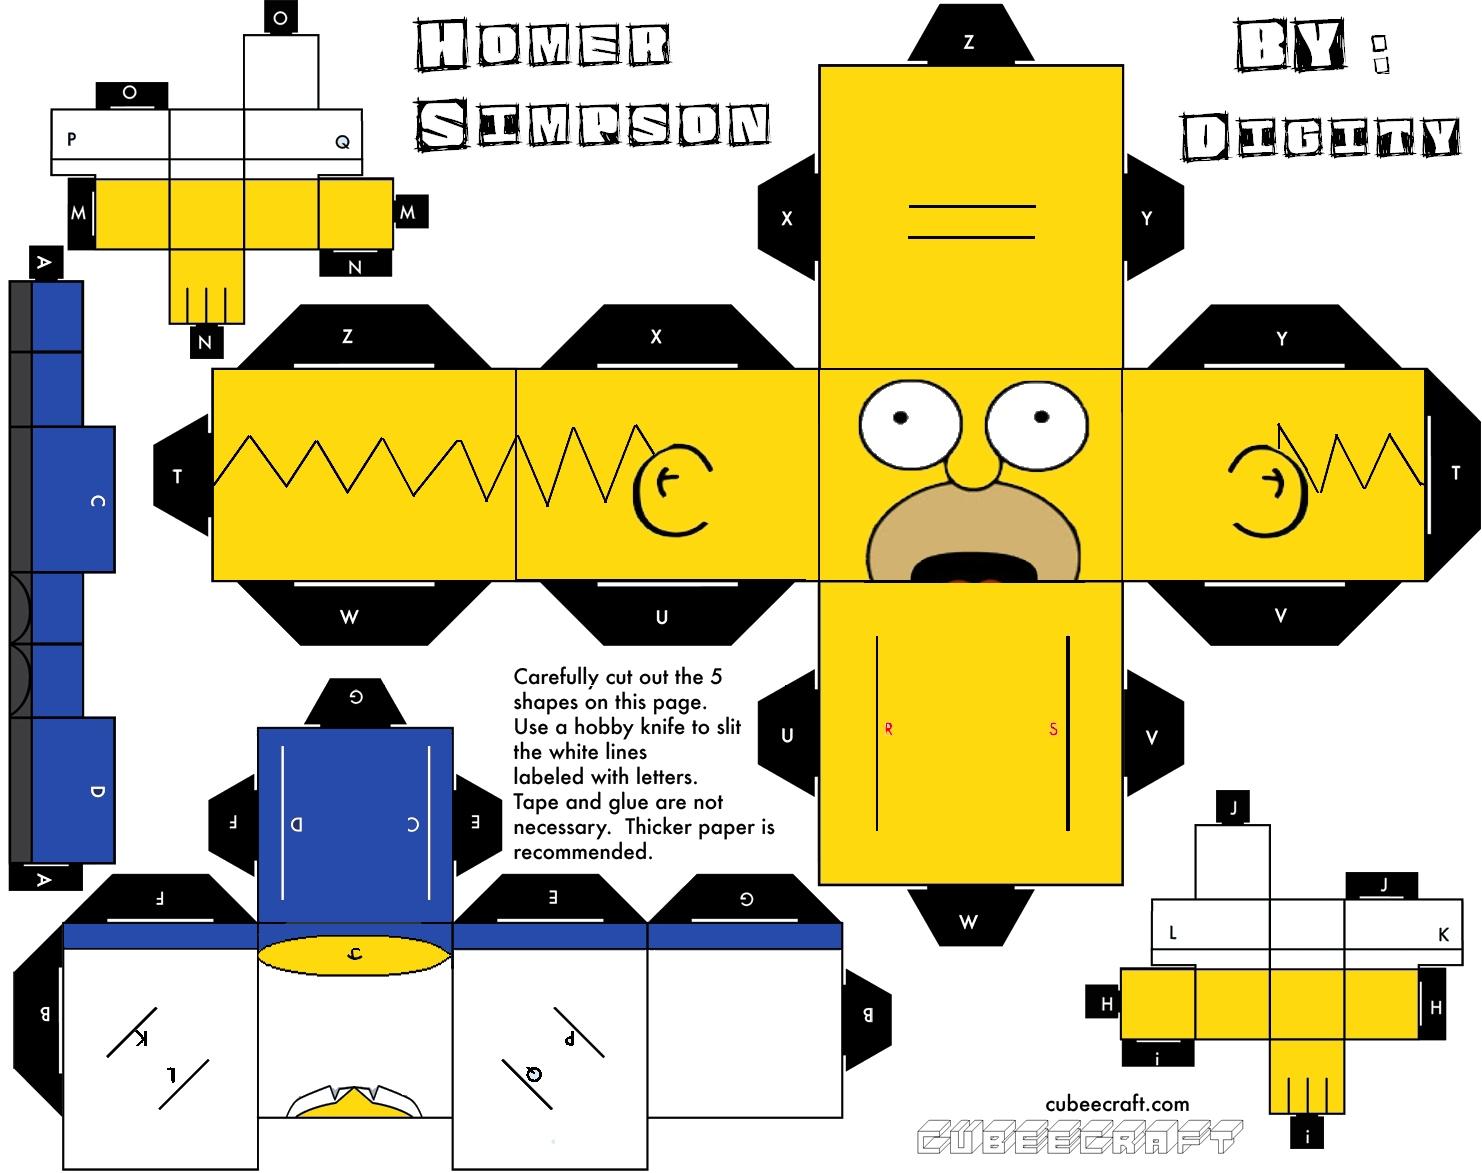 Homero PaperCraft